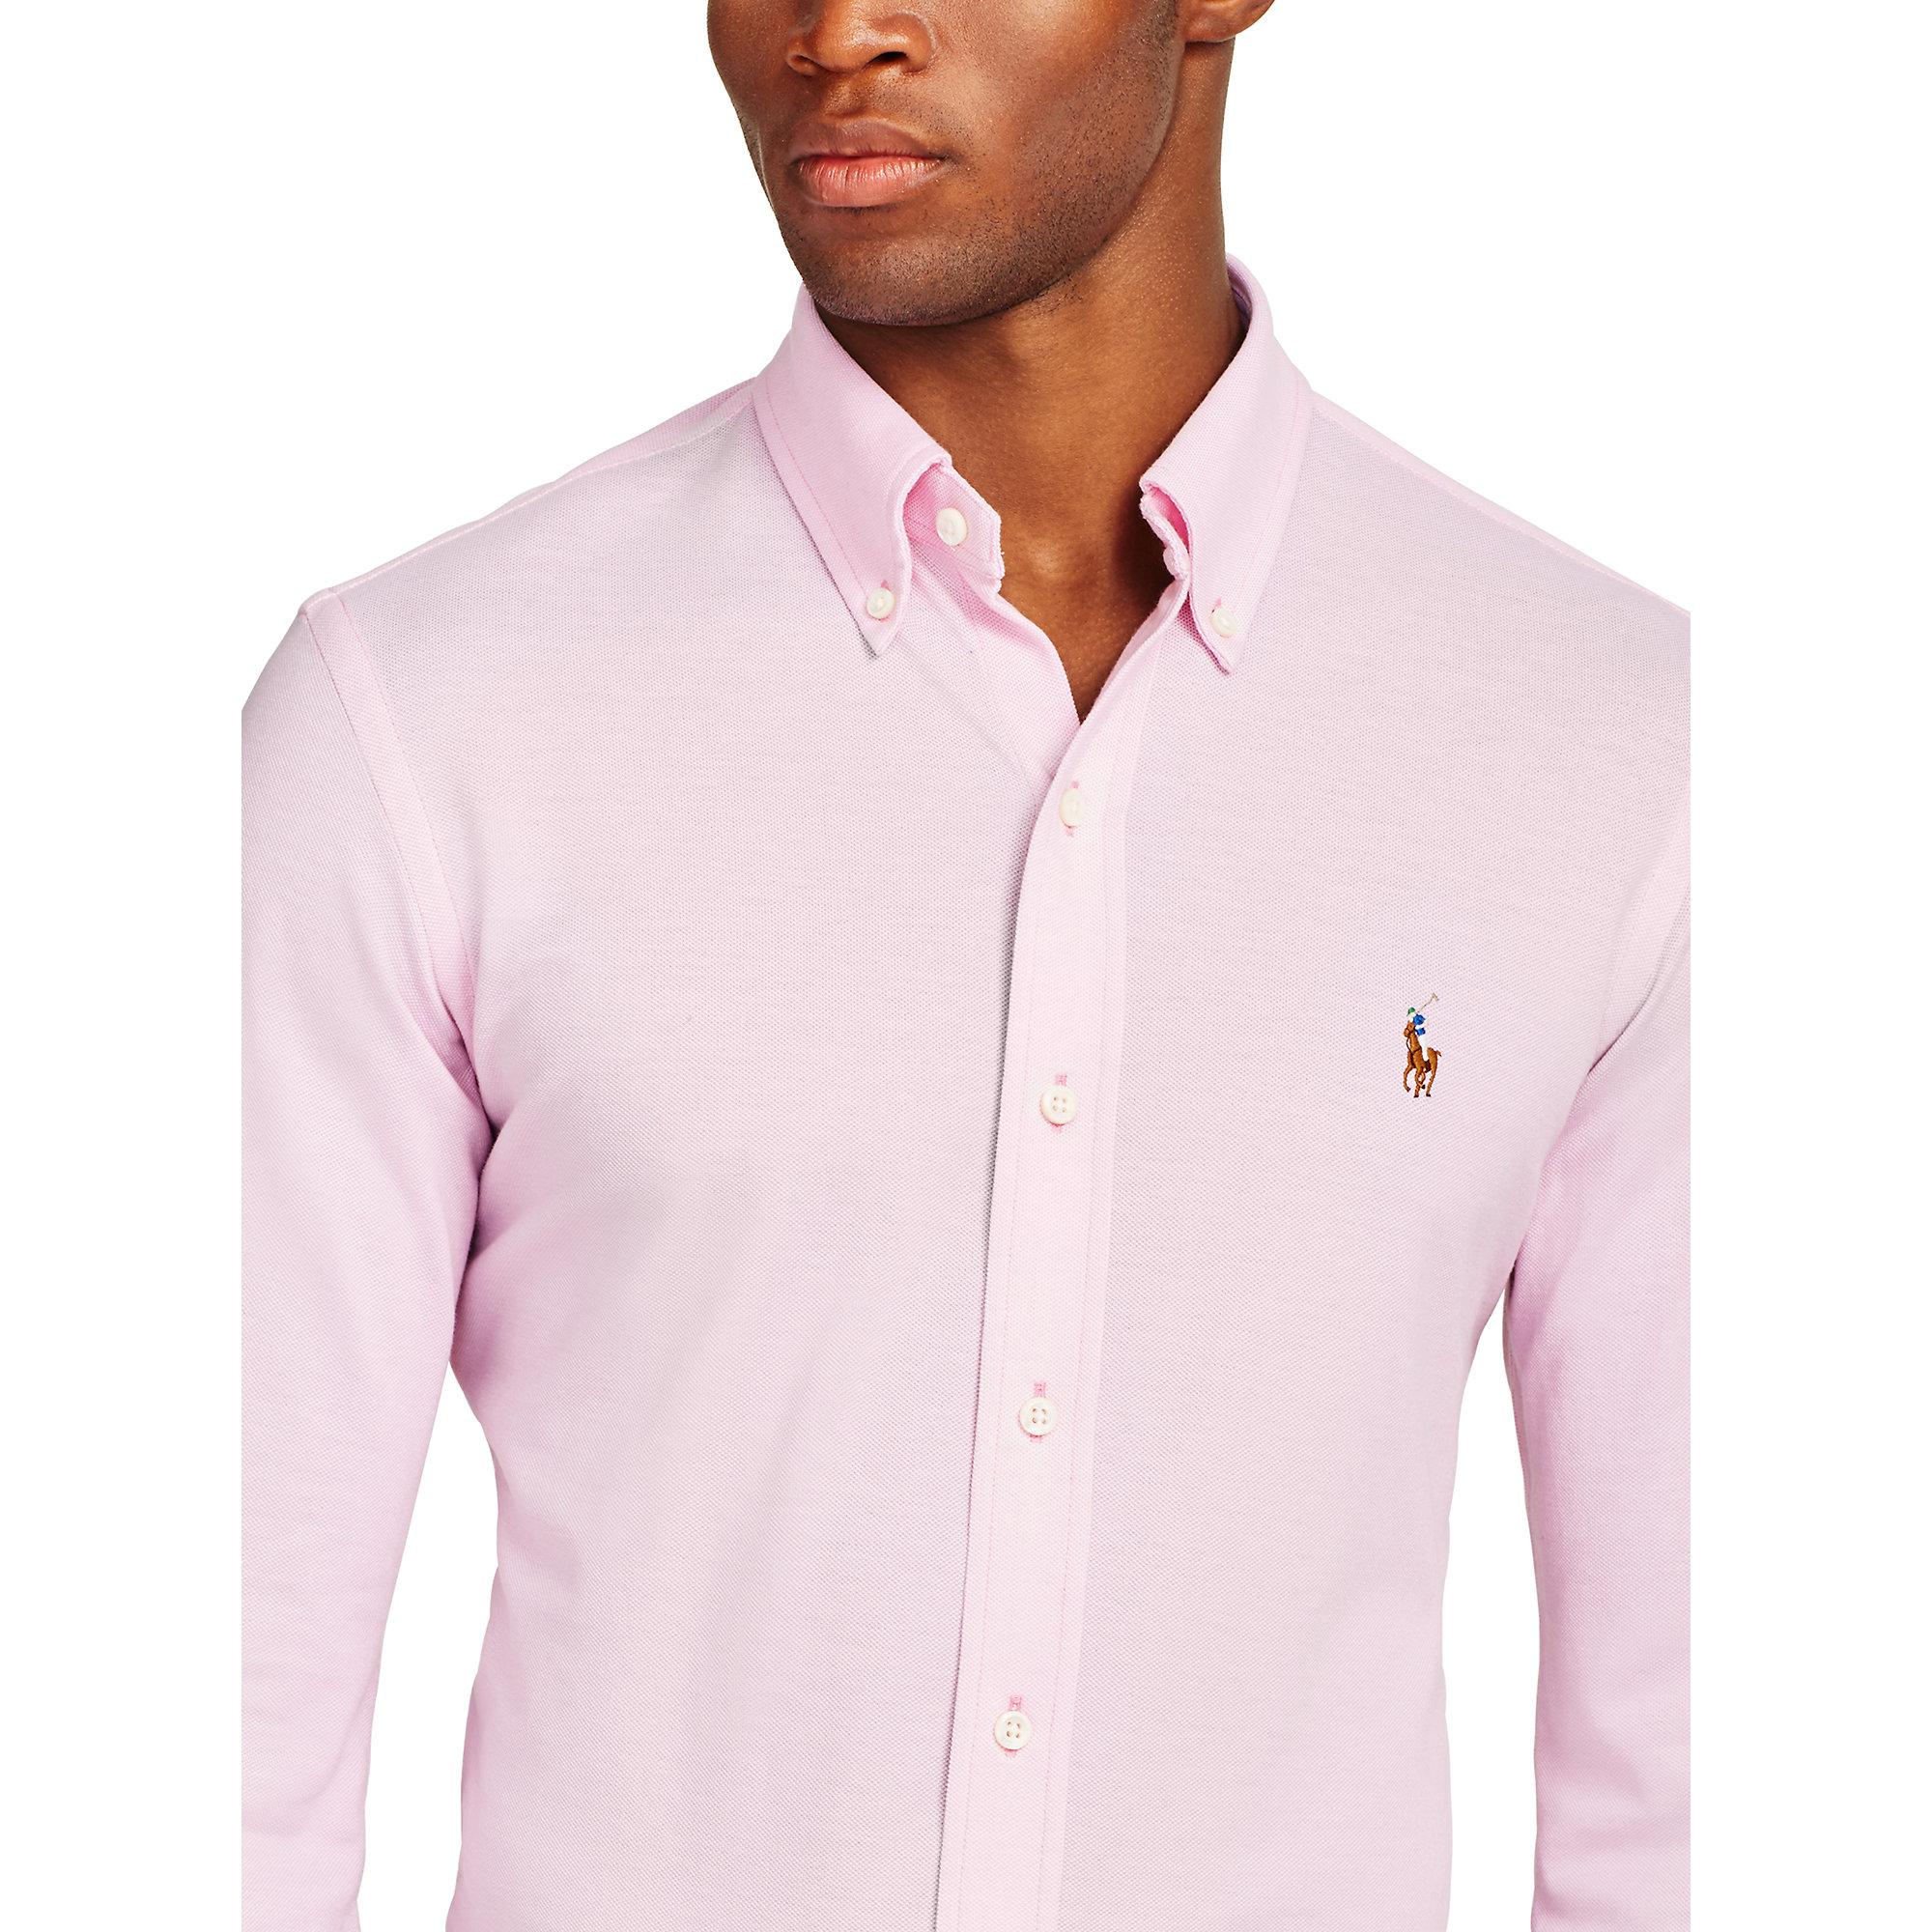 3d820eae Polo Ralph Lauren Knit Oxford Shirt in Pink for Men - Lyst